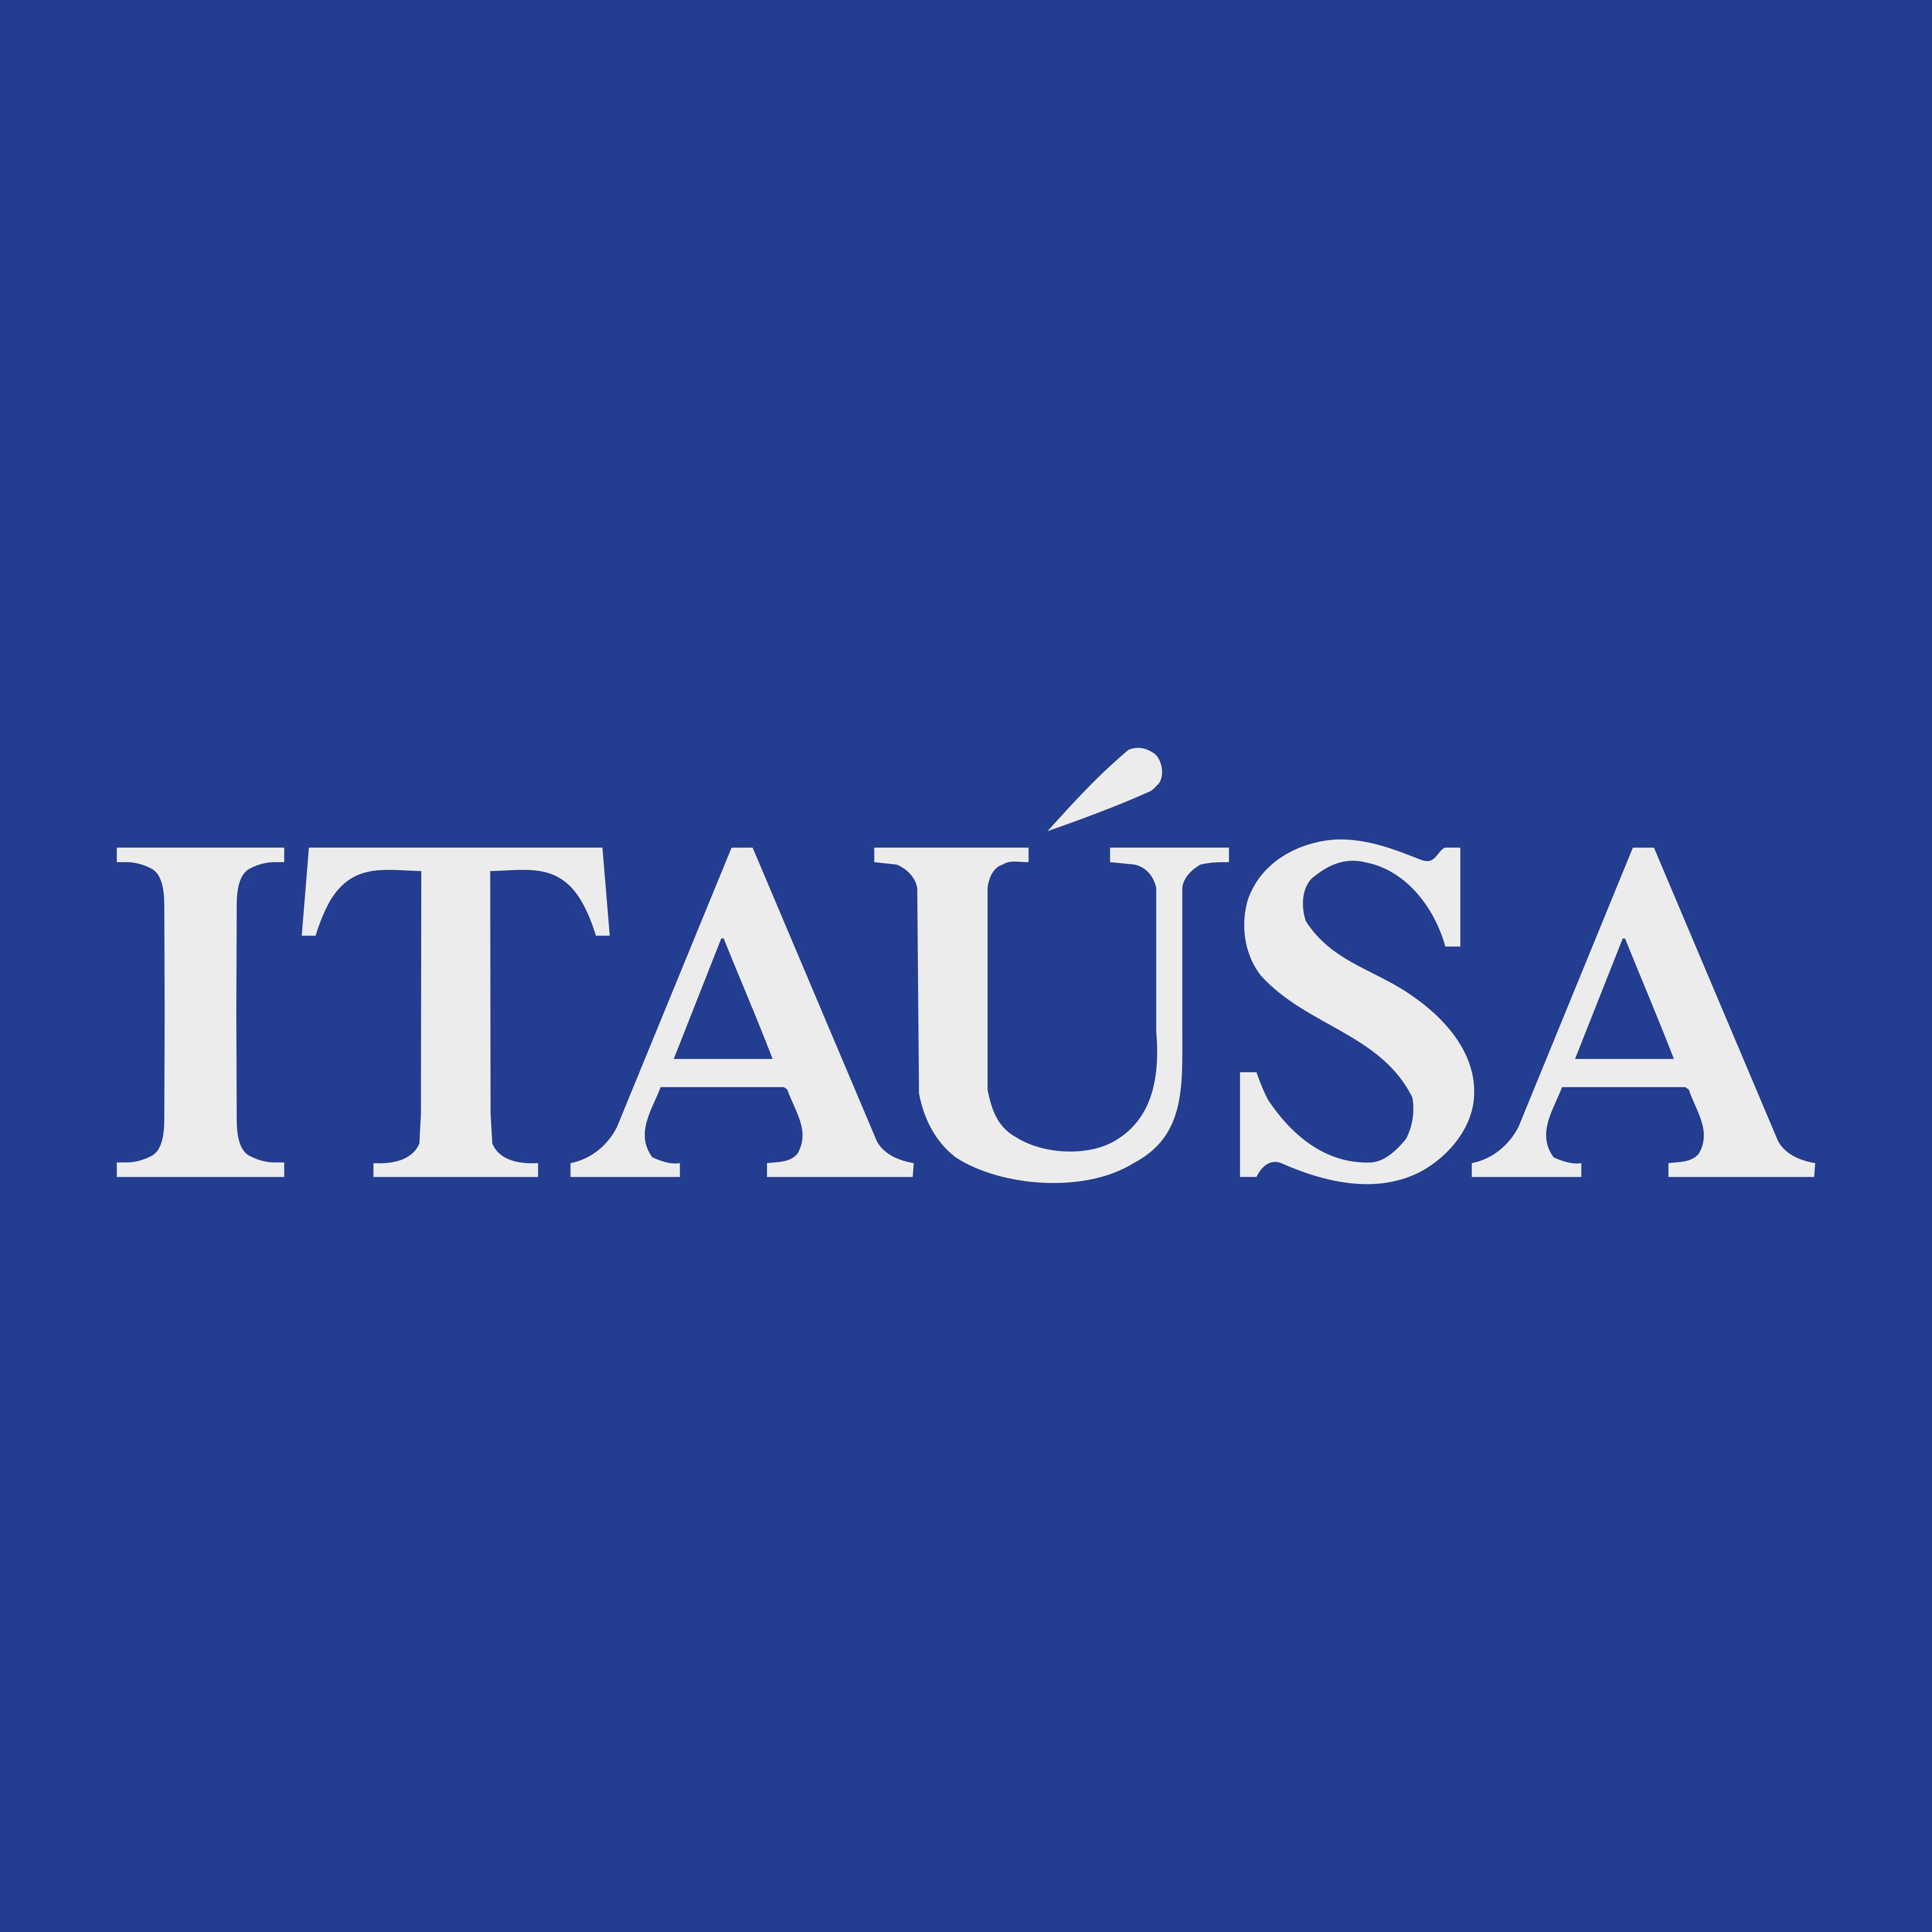 Itaúsa Logo PNG.